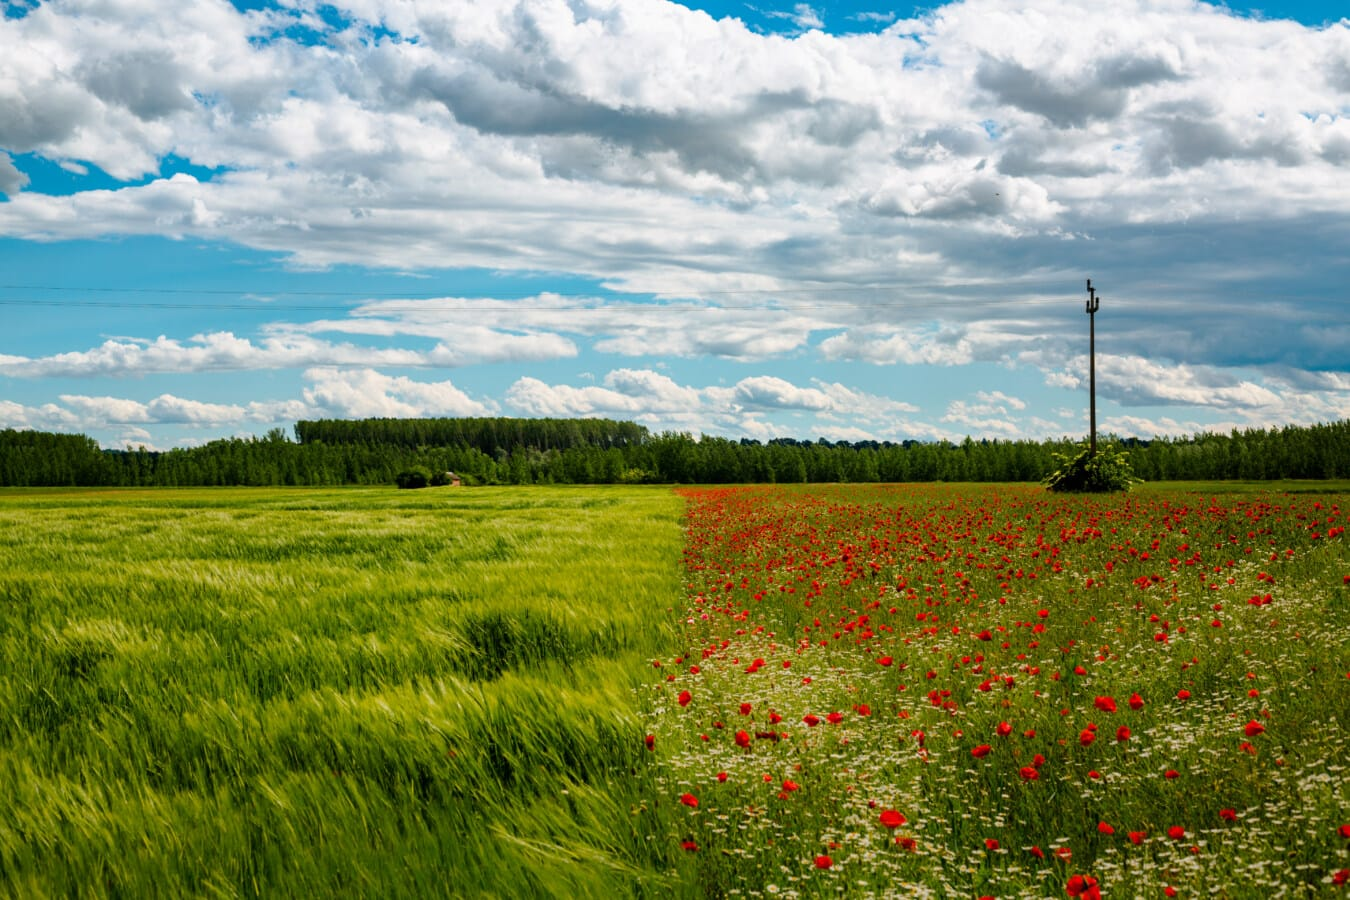 wheatfield, poppy, flowers, fair weather, agriculture, rural, meadow, summer, cloud, landscape